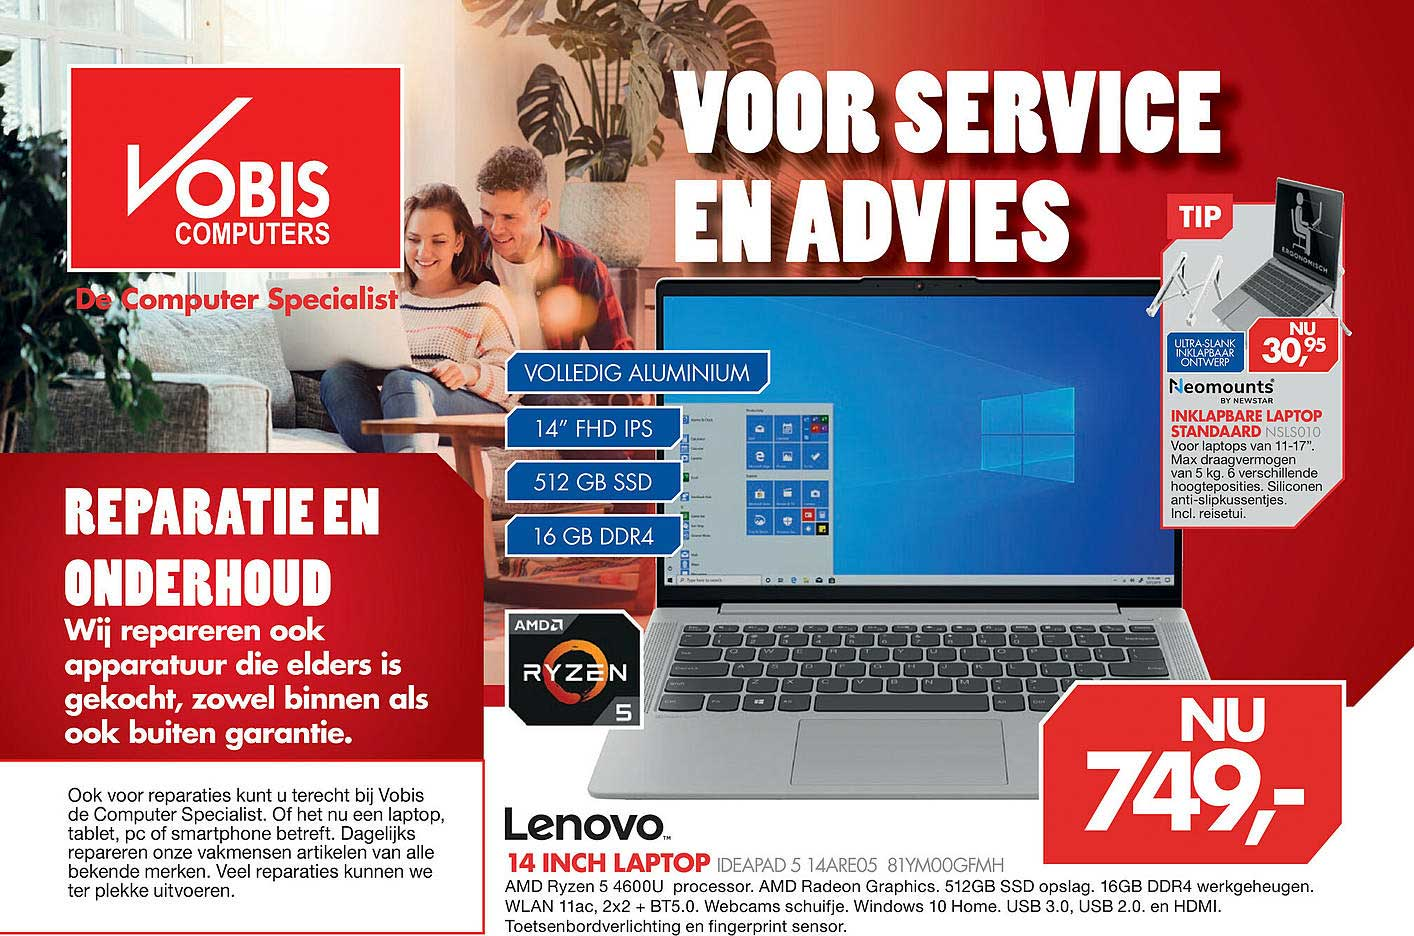 Vobis Lenovo 14 Inch Laptop Ideapad 5 14ARE05 81YM00GFMH